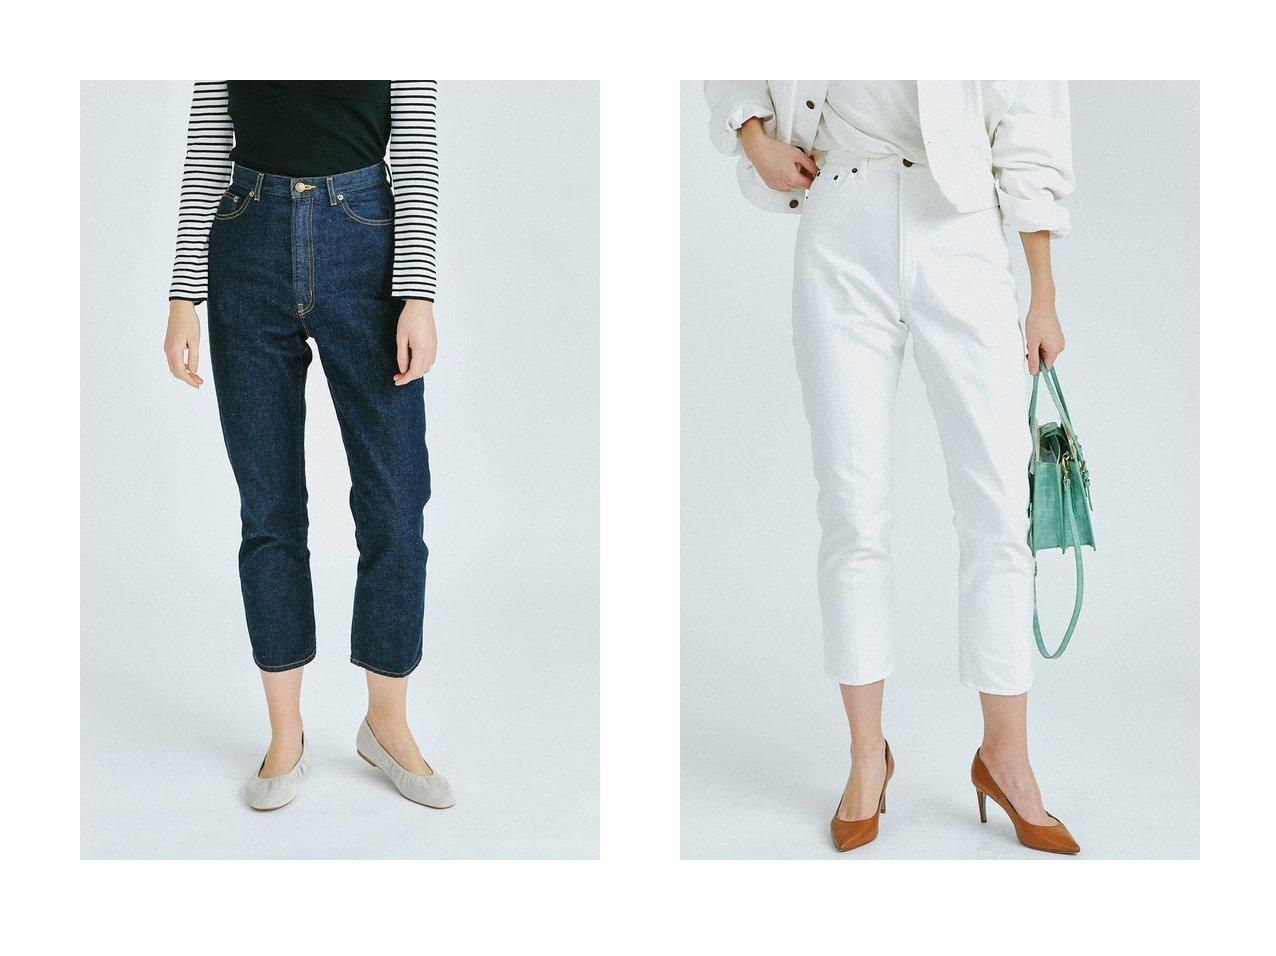 【LANVIN en Bleu/ランバン オン ブルー】のセンタープレステーパードデニム LANVIN en Bleuのおすすめ!人気、トレンド・レディースファッションの通販 おすすめで人気の流行・トレンド、ファッションの通販商品 メンズファッション・キッズファッション・インテリア・家具・レディースファッション・服の通販 founy(ファニー) https://founy.com/ ファッション Fashion レディースファッション WOMEN パンツ Pants デニムパンツ Denim Pants 春 Spring シアー ジャケット セットアップ センター とろみ デニム バランス ポケット 2021年 2021 S/S 春夏 SS Spring/Summer 2021 春夏 S/S SS Spring/Summer 2021 |ID:crp329100000019532